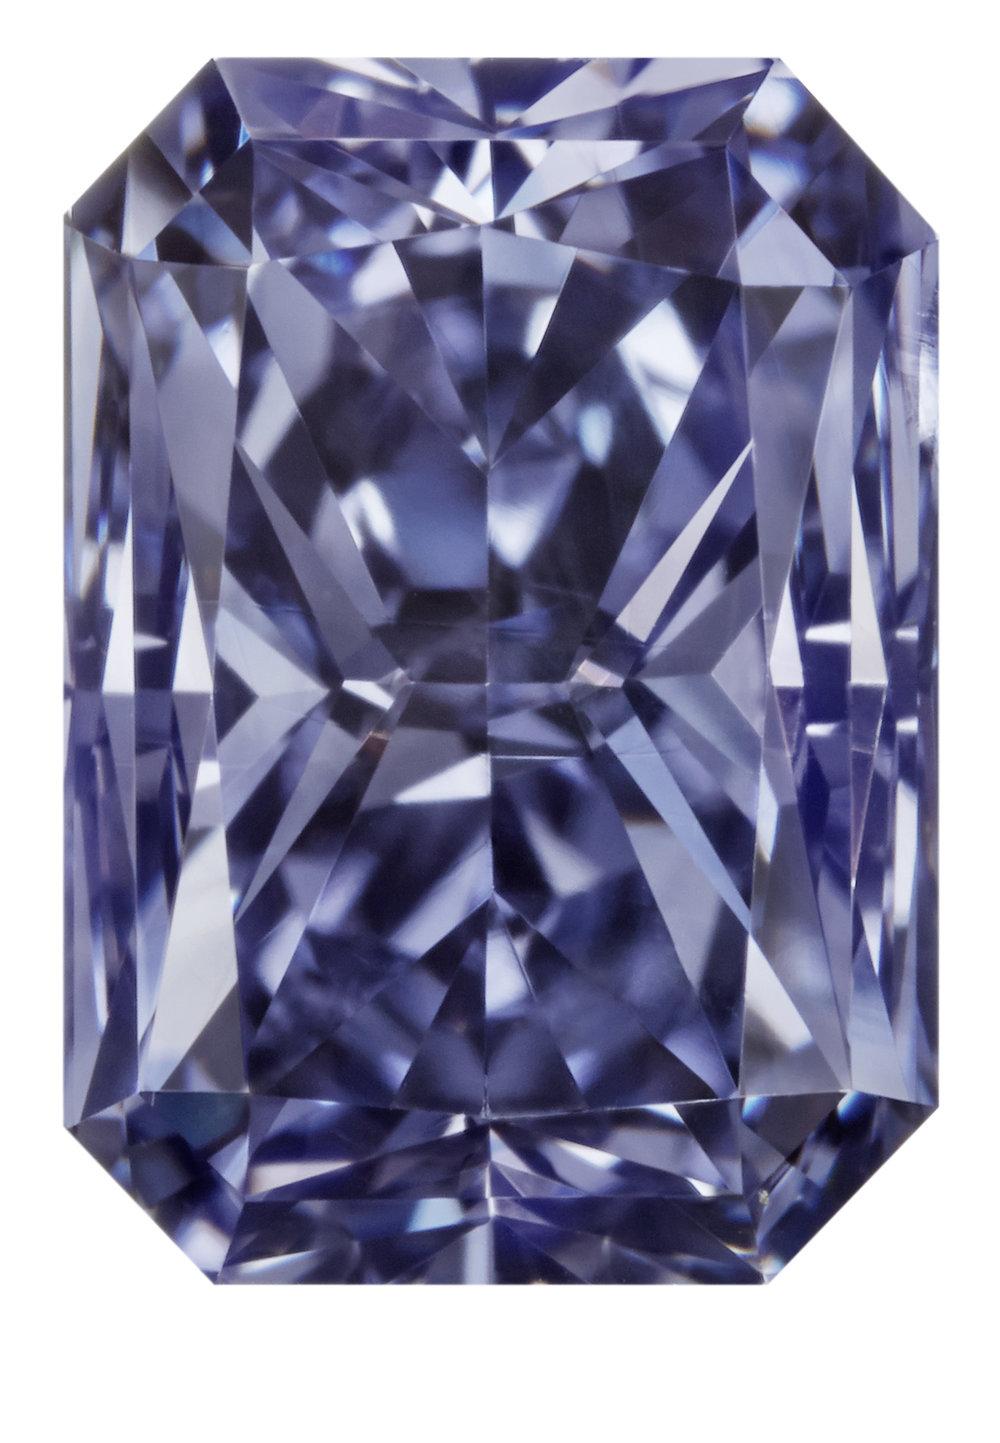 Argyle Liberté™, a 0.91 carat radiant shaped Fancy Deep Gray-Violet diamond. PHOTO: Copyright © 2017 Argyle Diamonds Limited